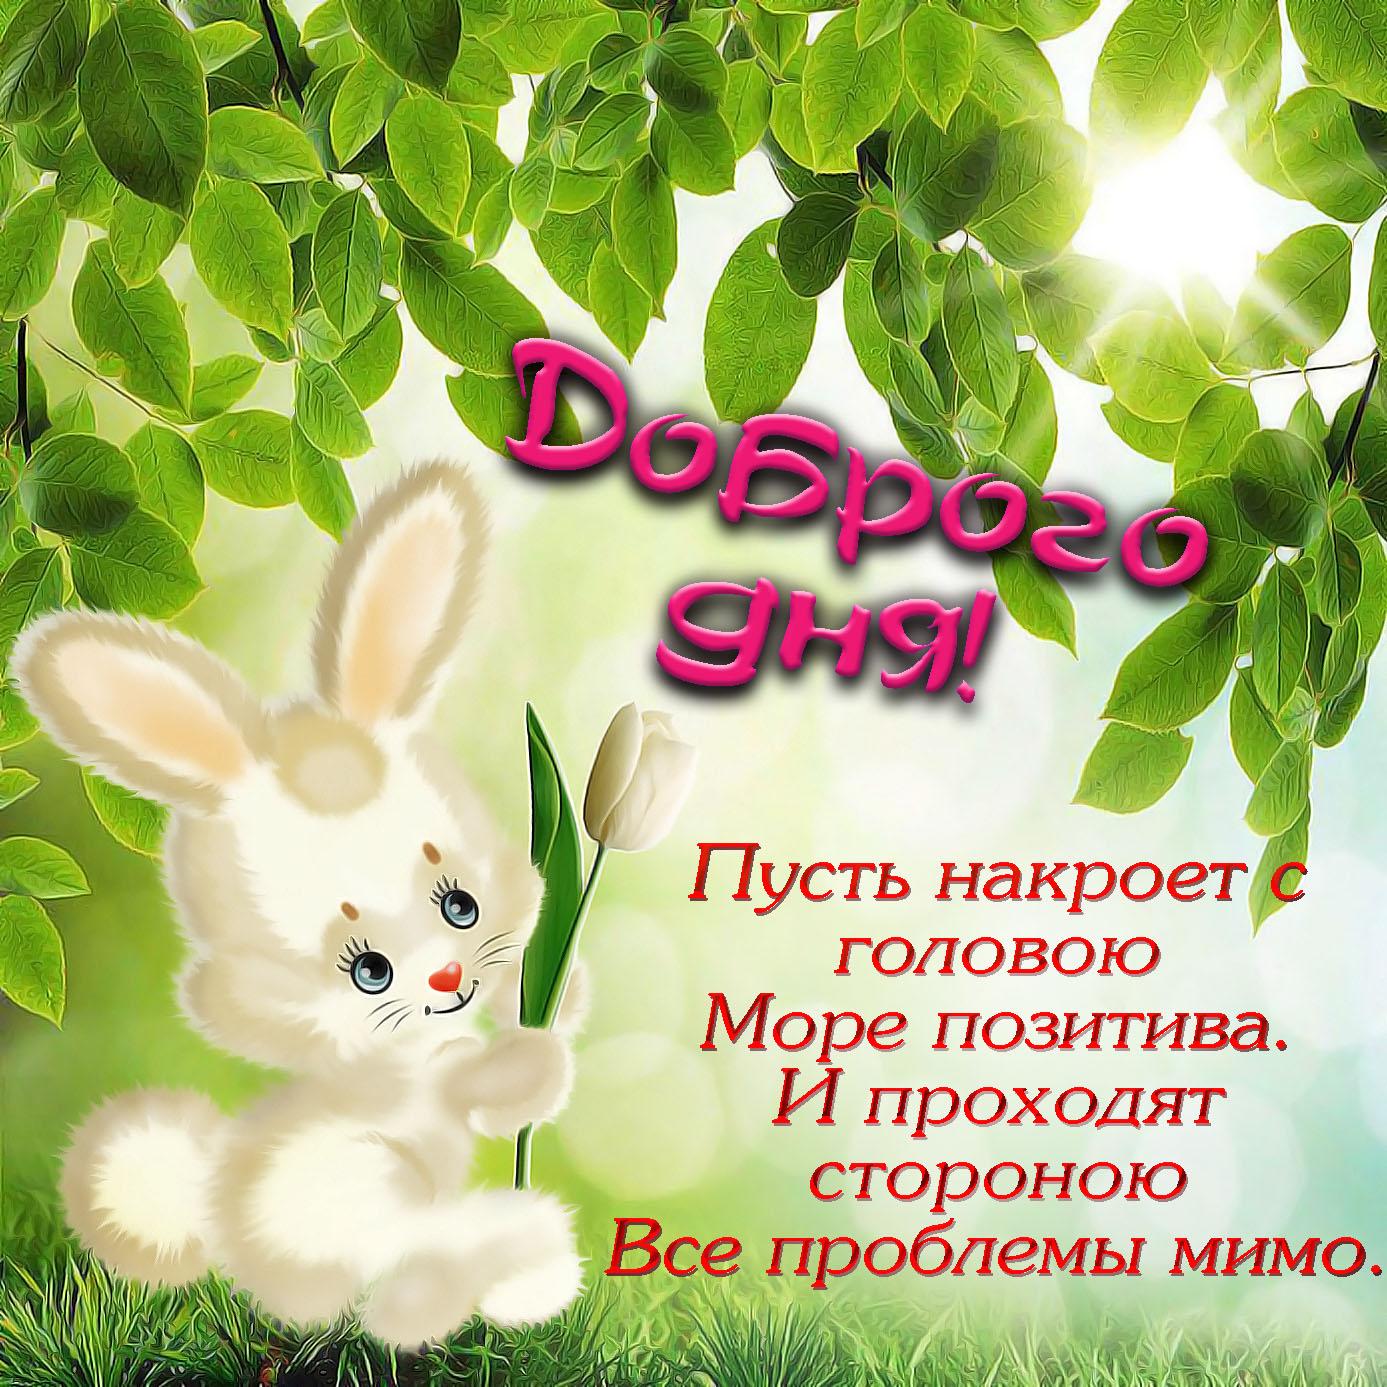 Картинка с зайчиком желающим доброго дня